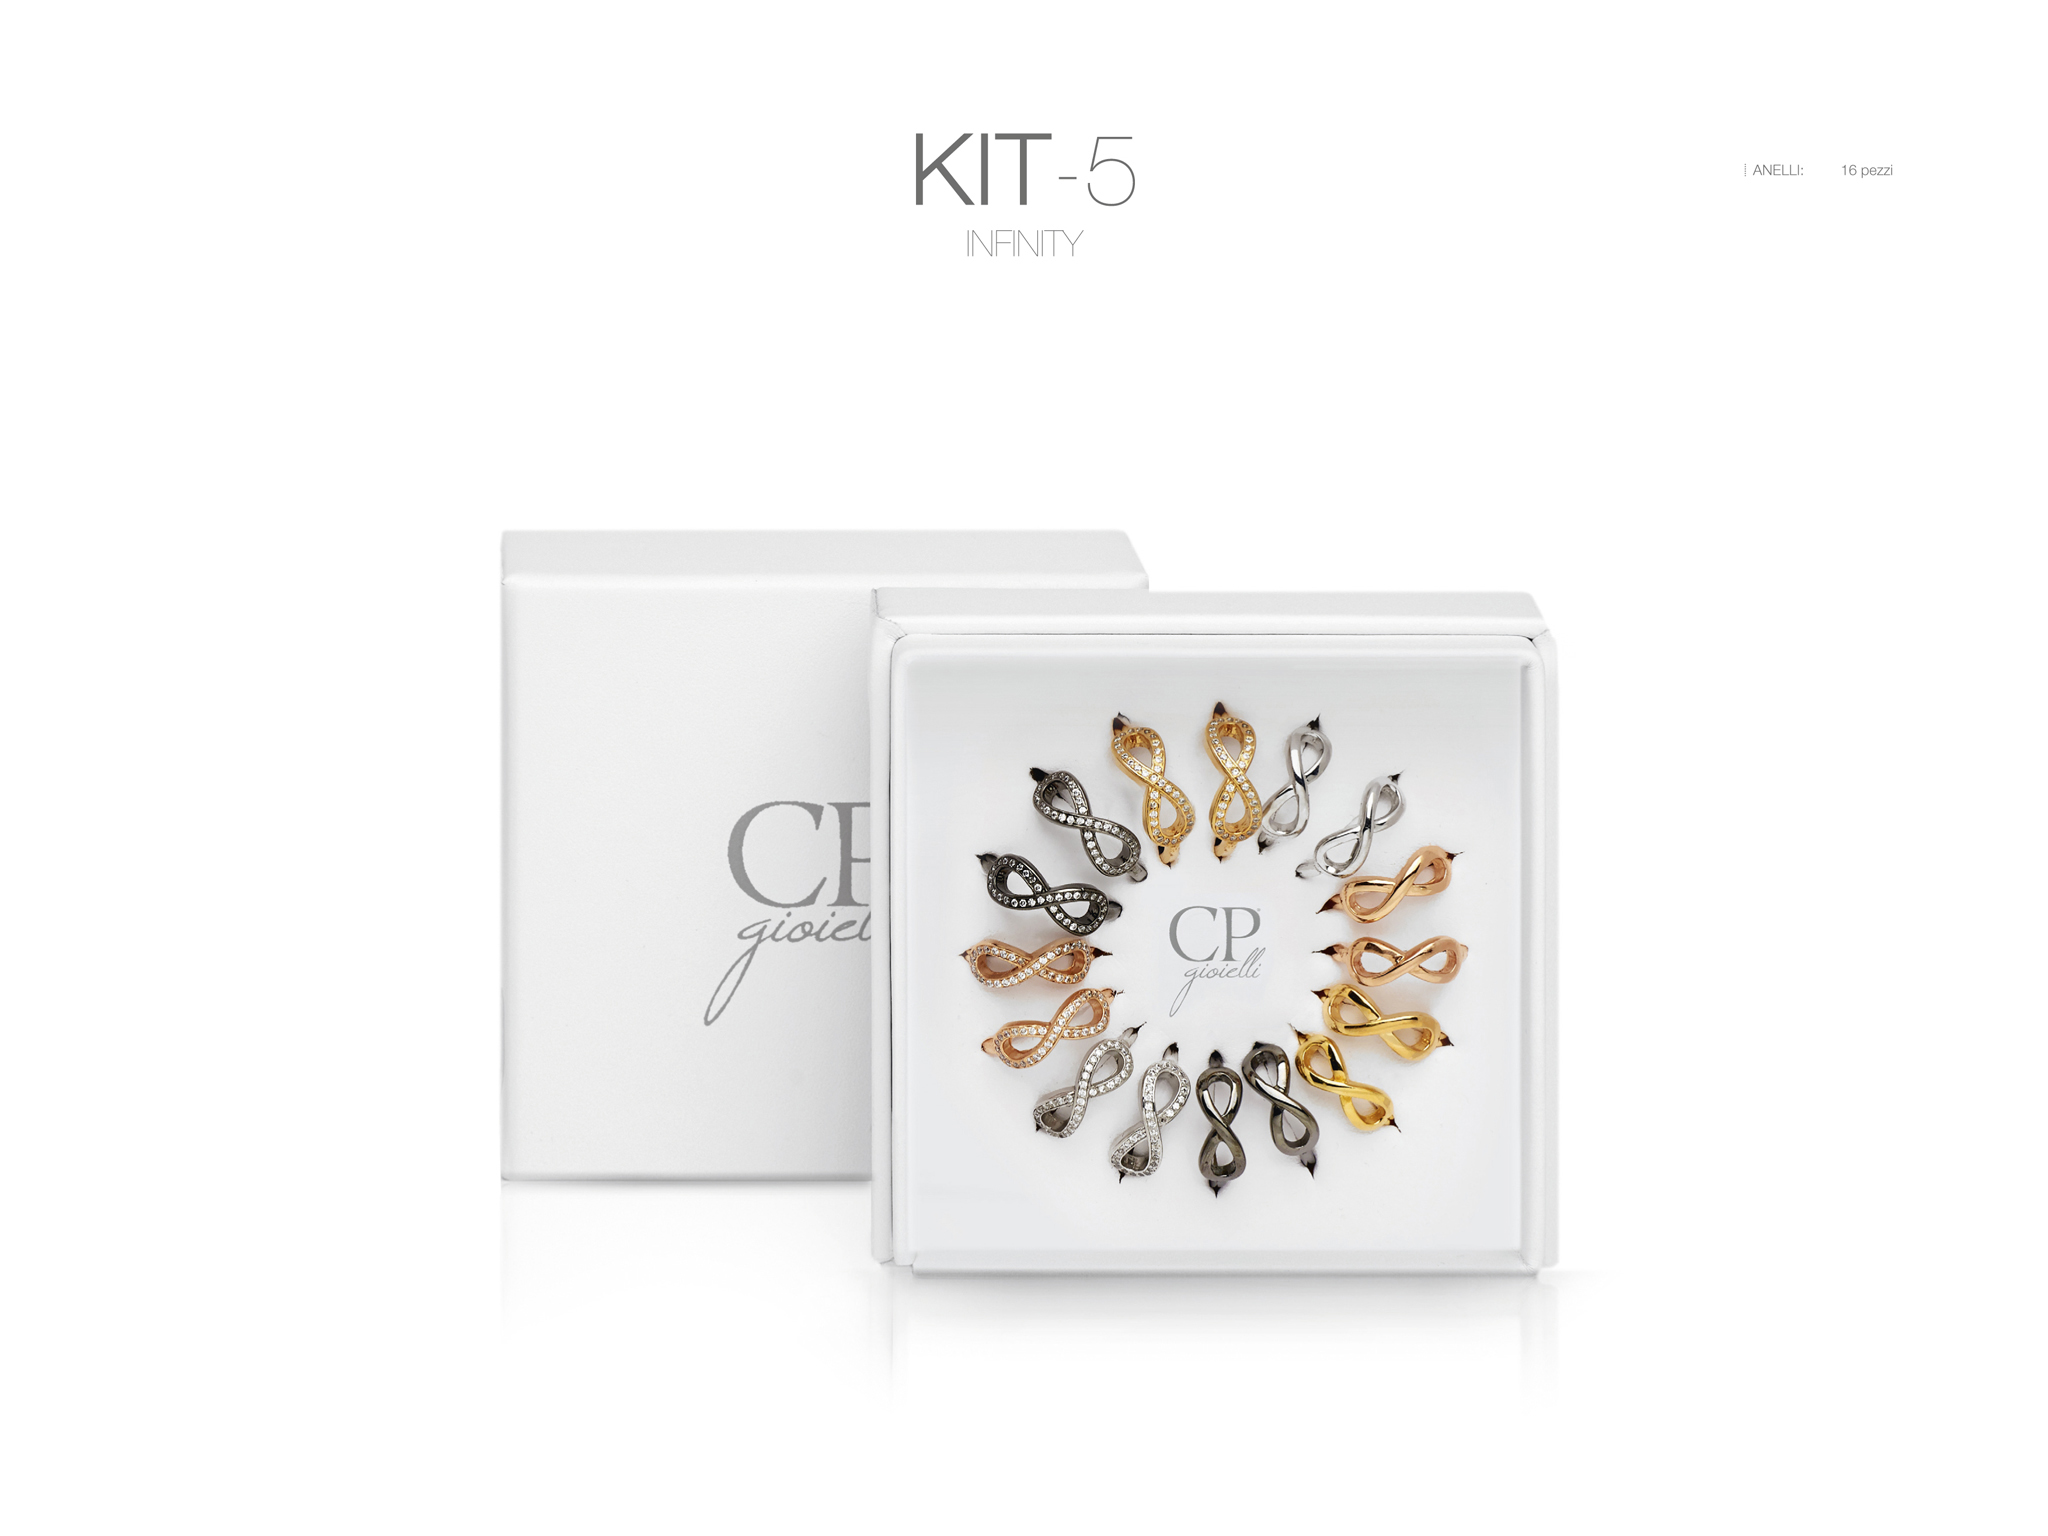 kit_argento_2-0_2016_pagina_21_app